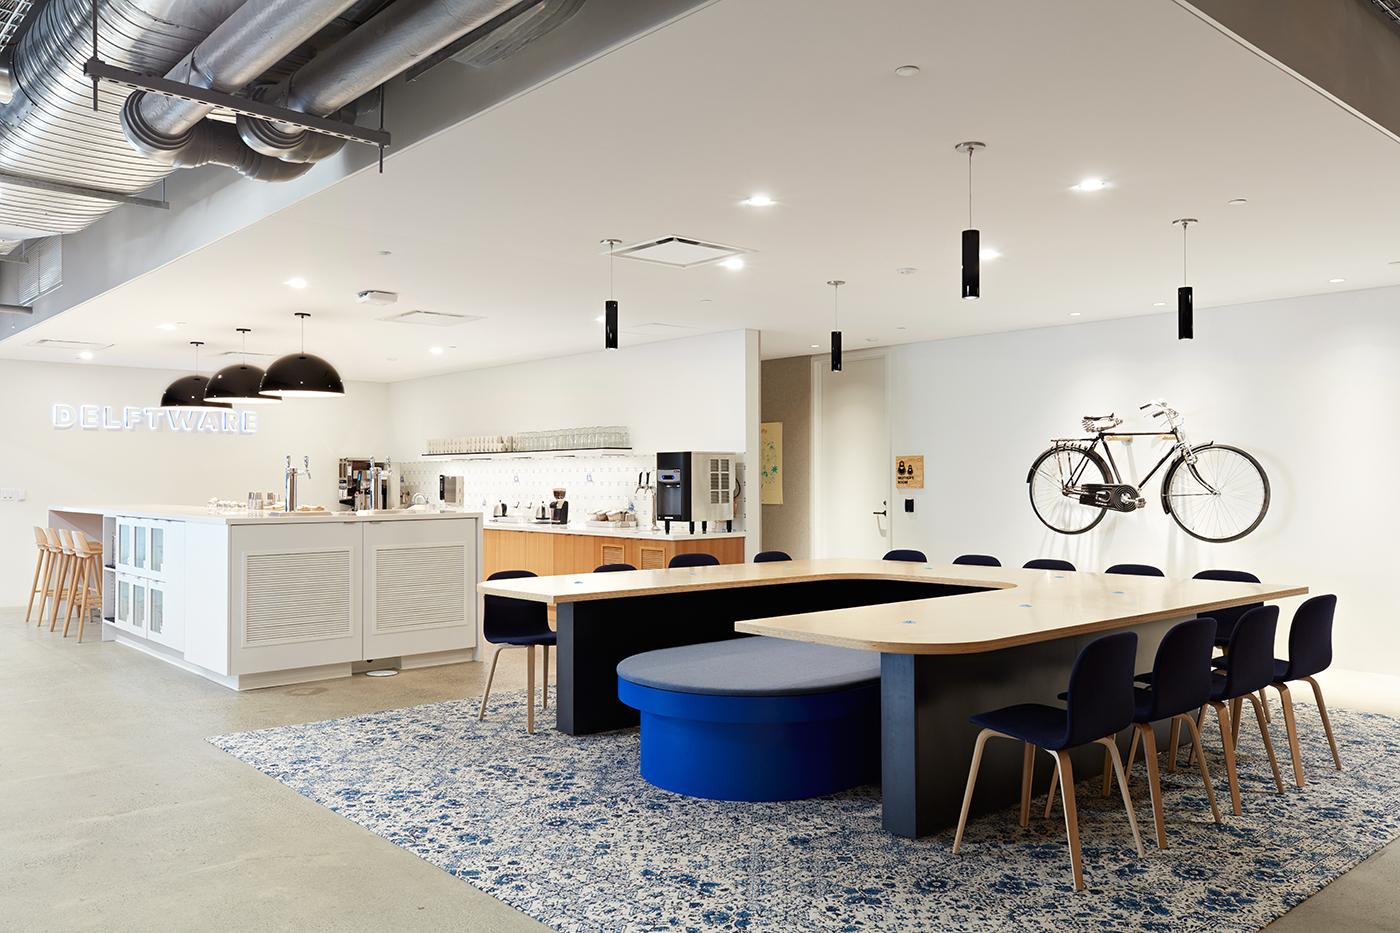 airbnb office. Airbnb Office - 999 Brannan / Environments E